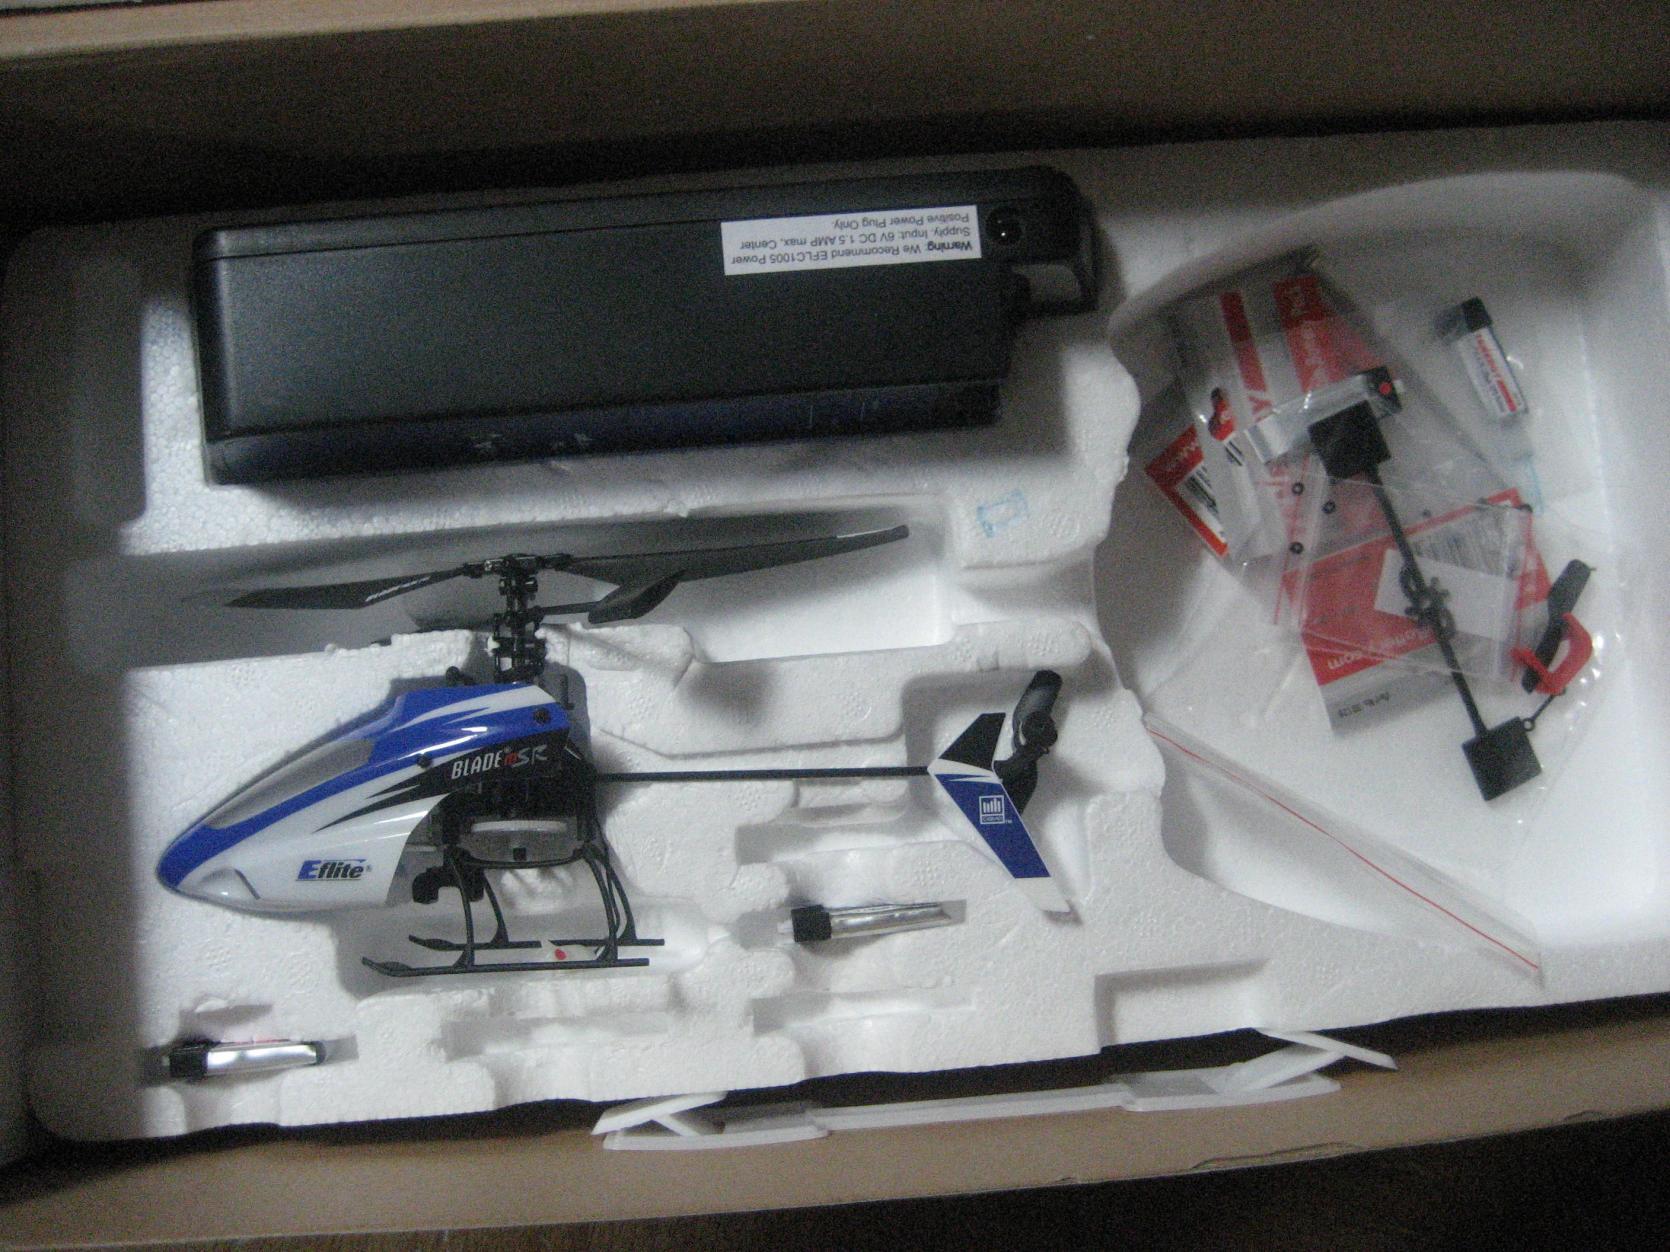 ... 2 Heliu0027s - E-flite Blade Msr u0026&; Blade Mcx heliu0027s W/Extra ... & 2 Heliu0027s - E-flite Blade Msr u0026 Blade Mcx heliu0027s W/Extra parts - R ...